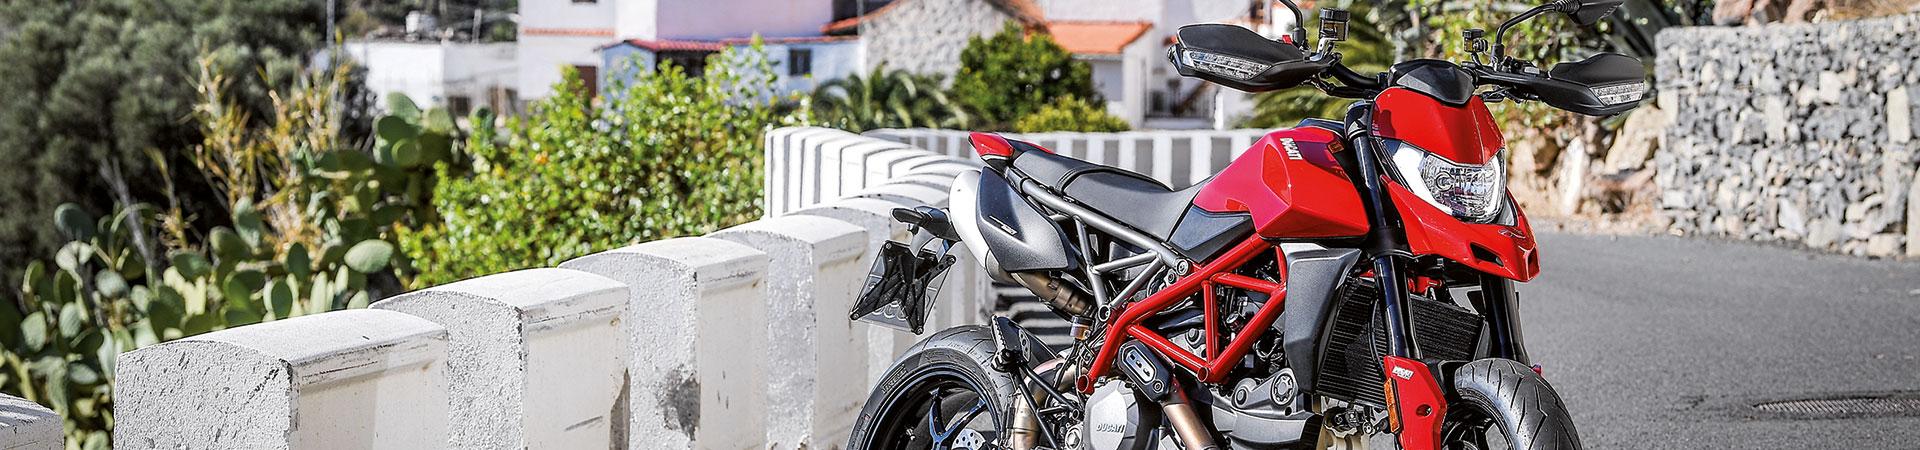 Titel-Ducati-Hypermotard-950-Modell-2019_26-04-2019_a734e